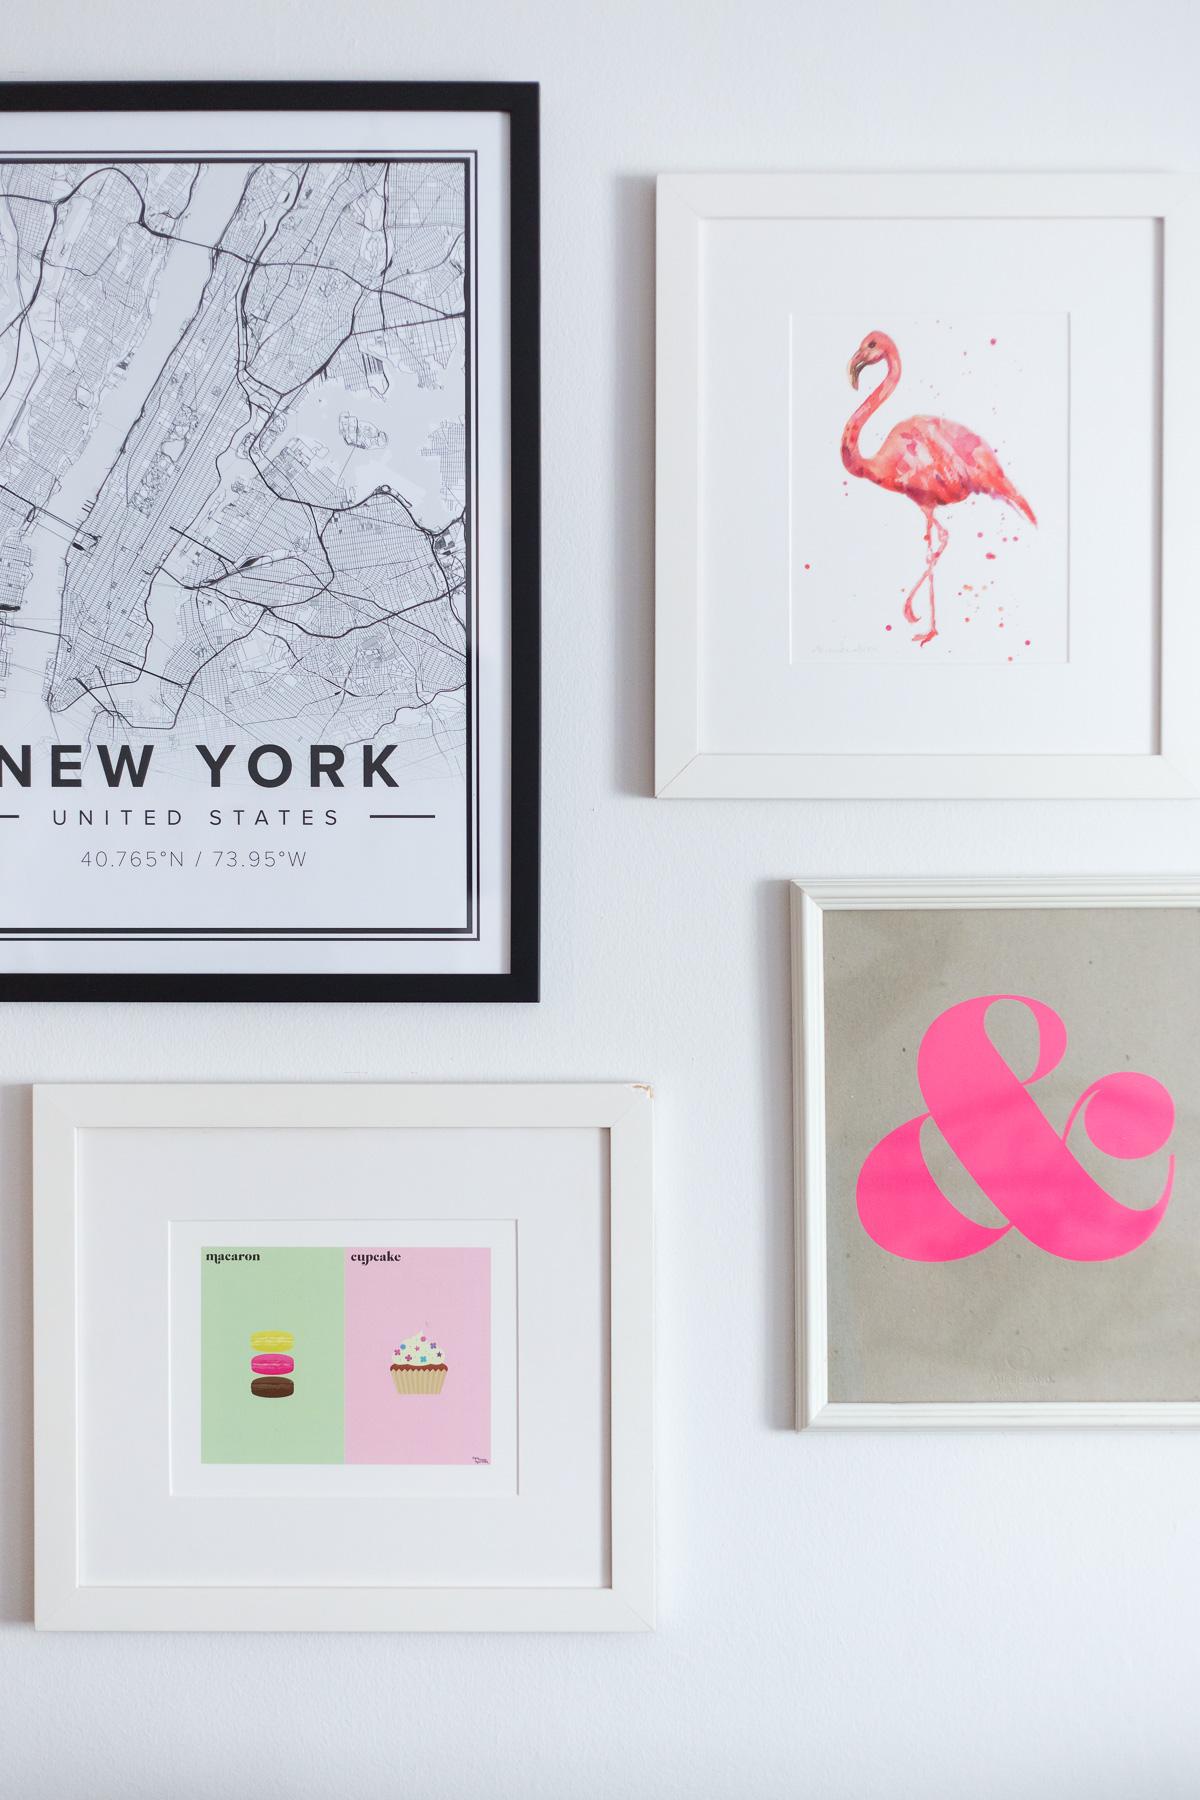 studio-apartment-gallery-wall-5451